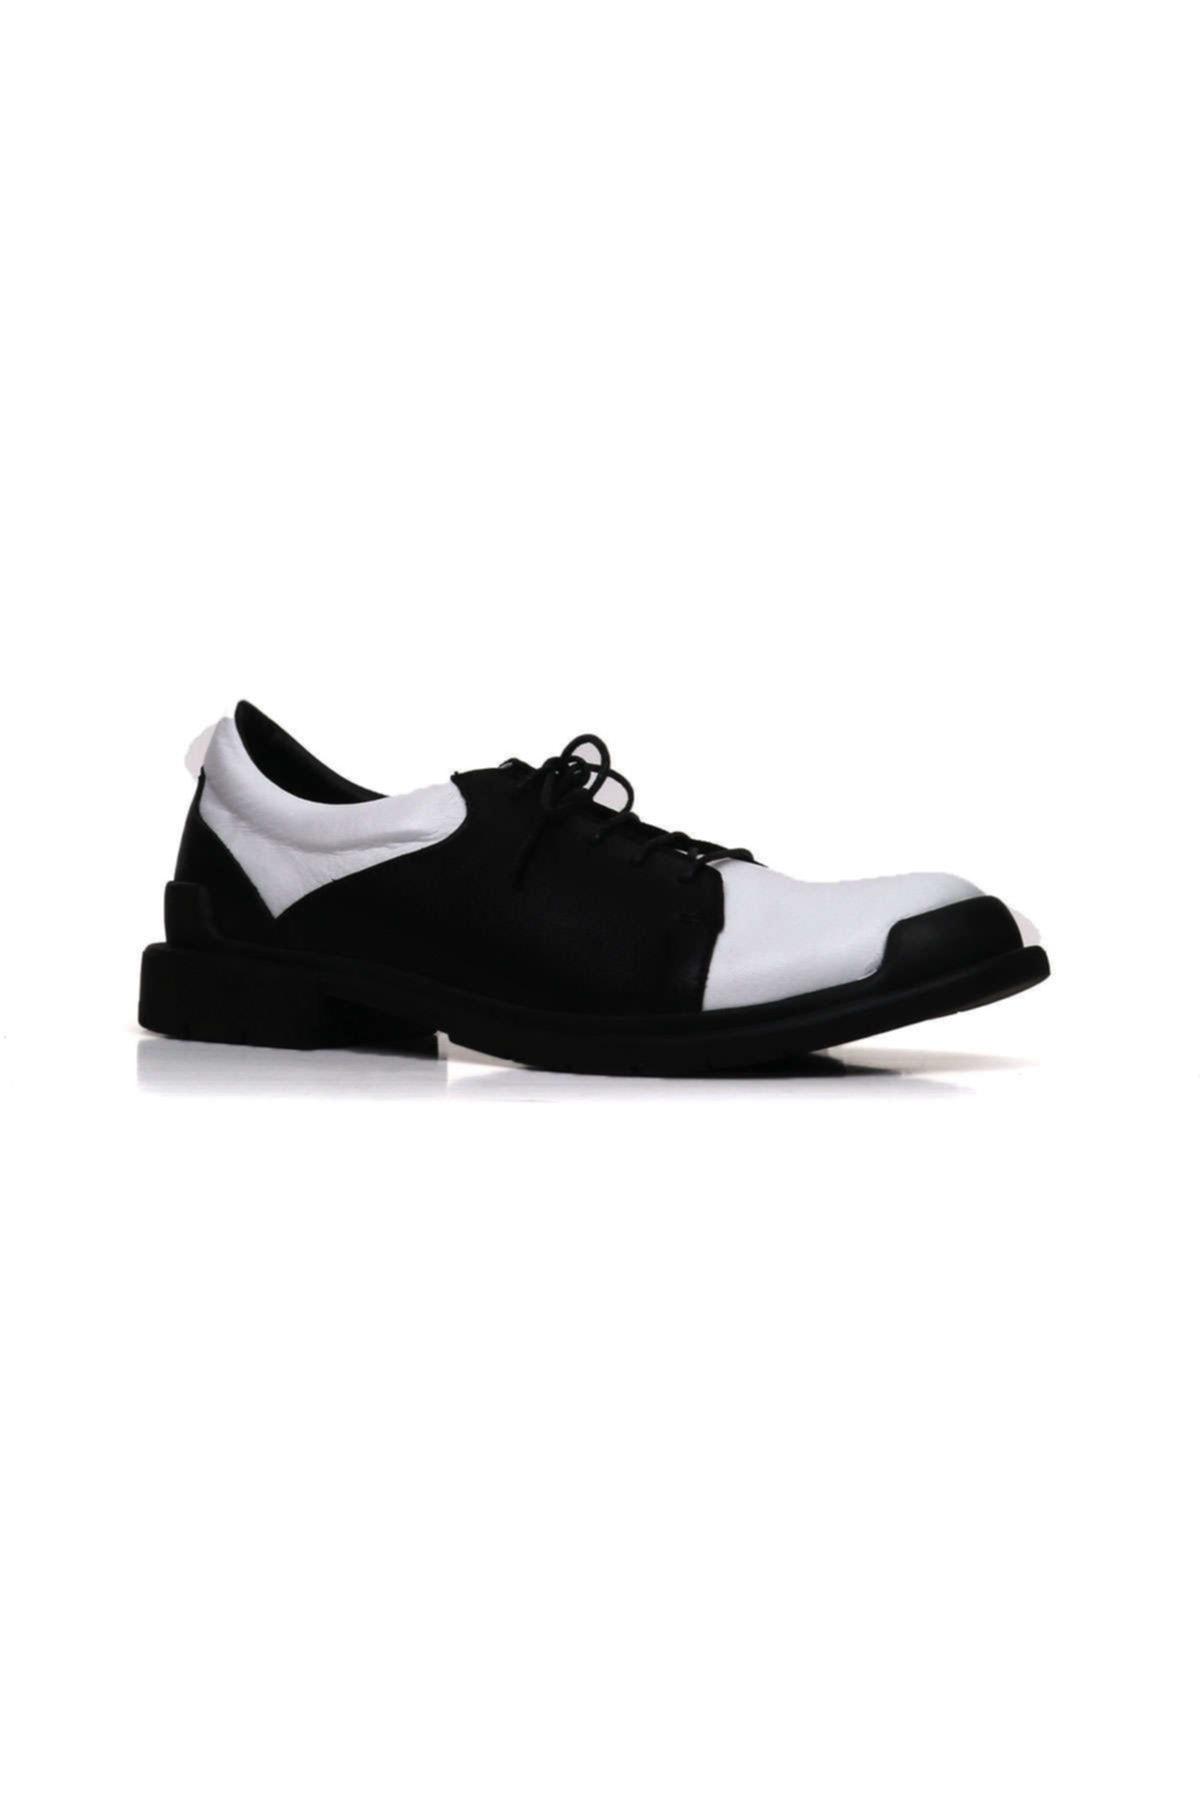 BUENO Shoes  Kadın Ayakkabı 9p7709 1